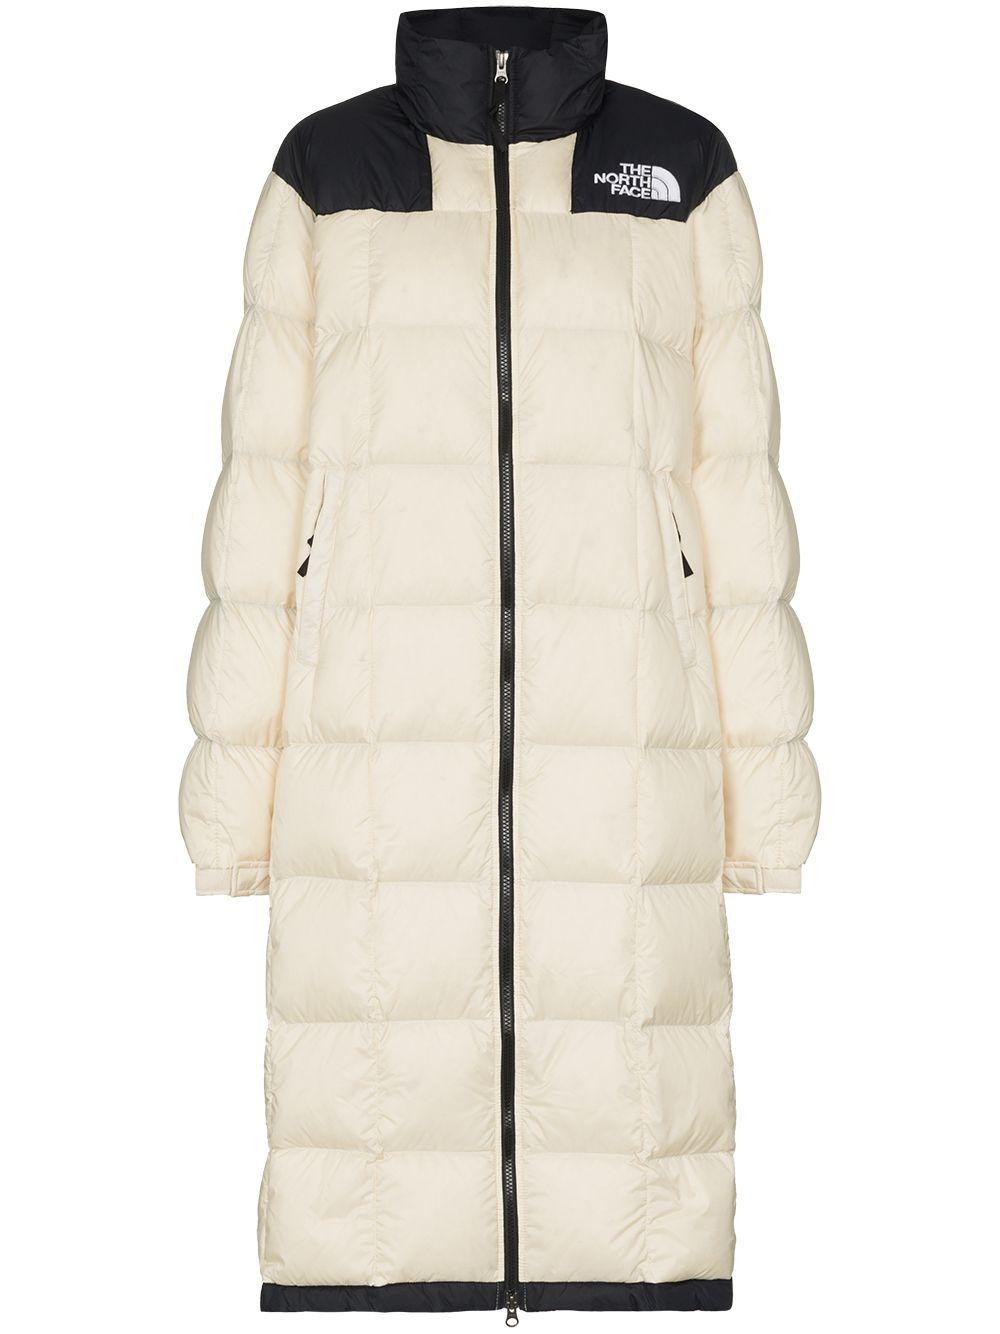 The North Face Lhotse Long Puffer Coat Farfetch Long Puffer Coat North Face Coat Puffer Coat [ 1334 x 1000 Pixel ]